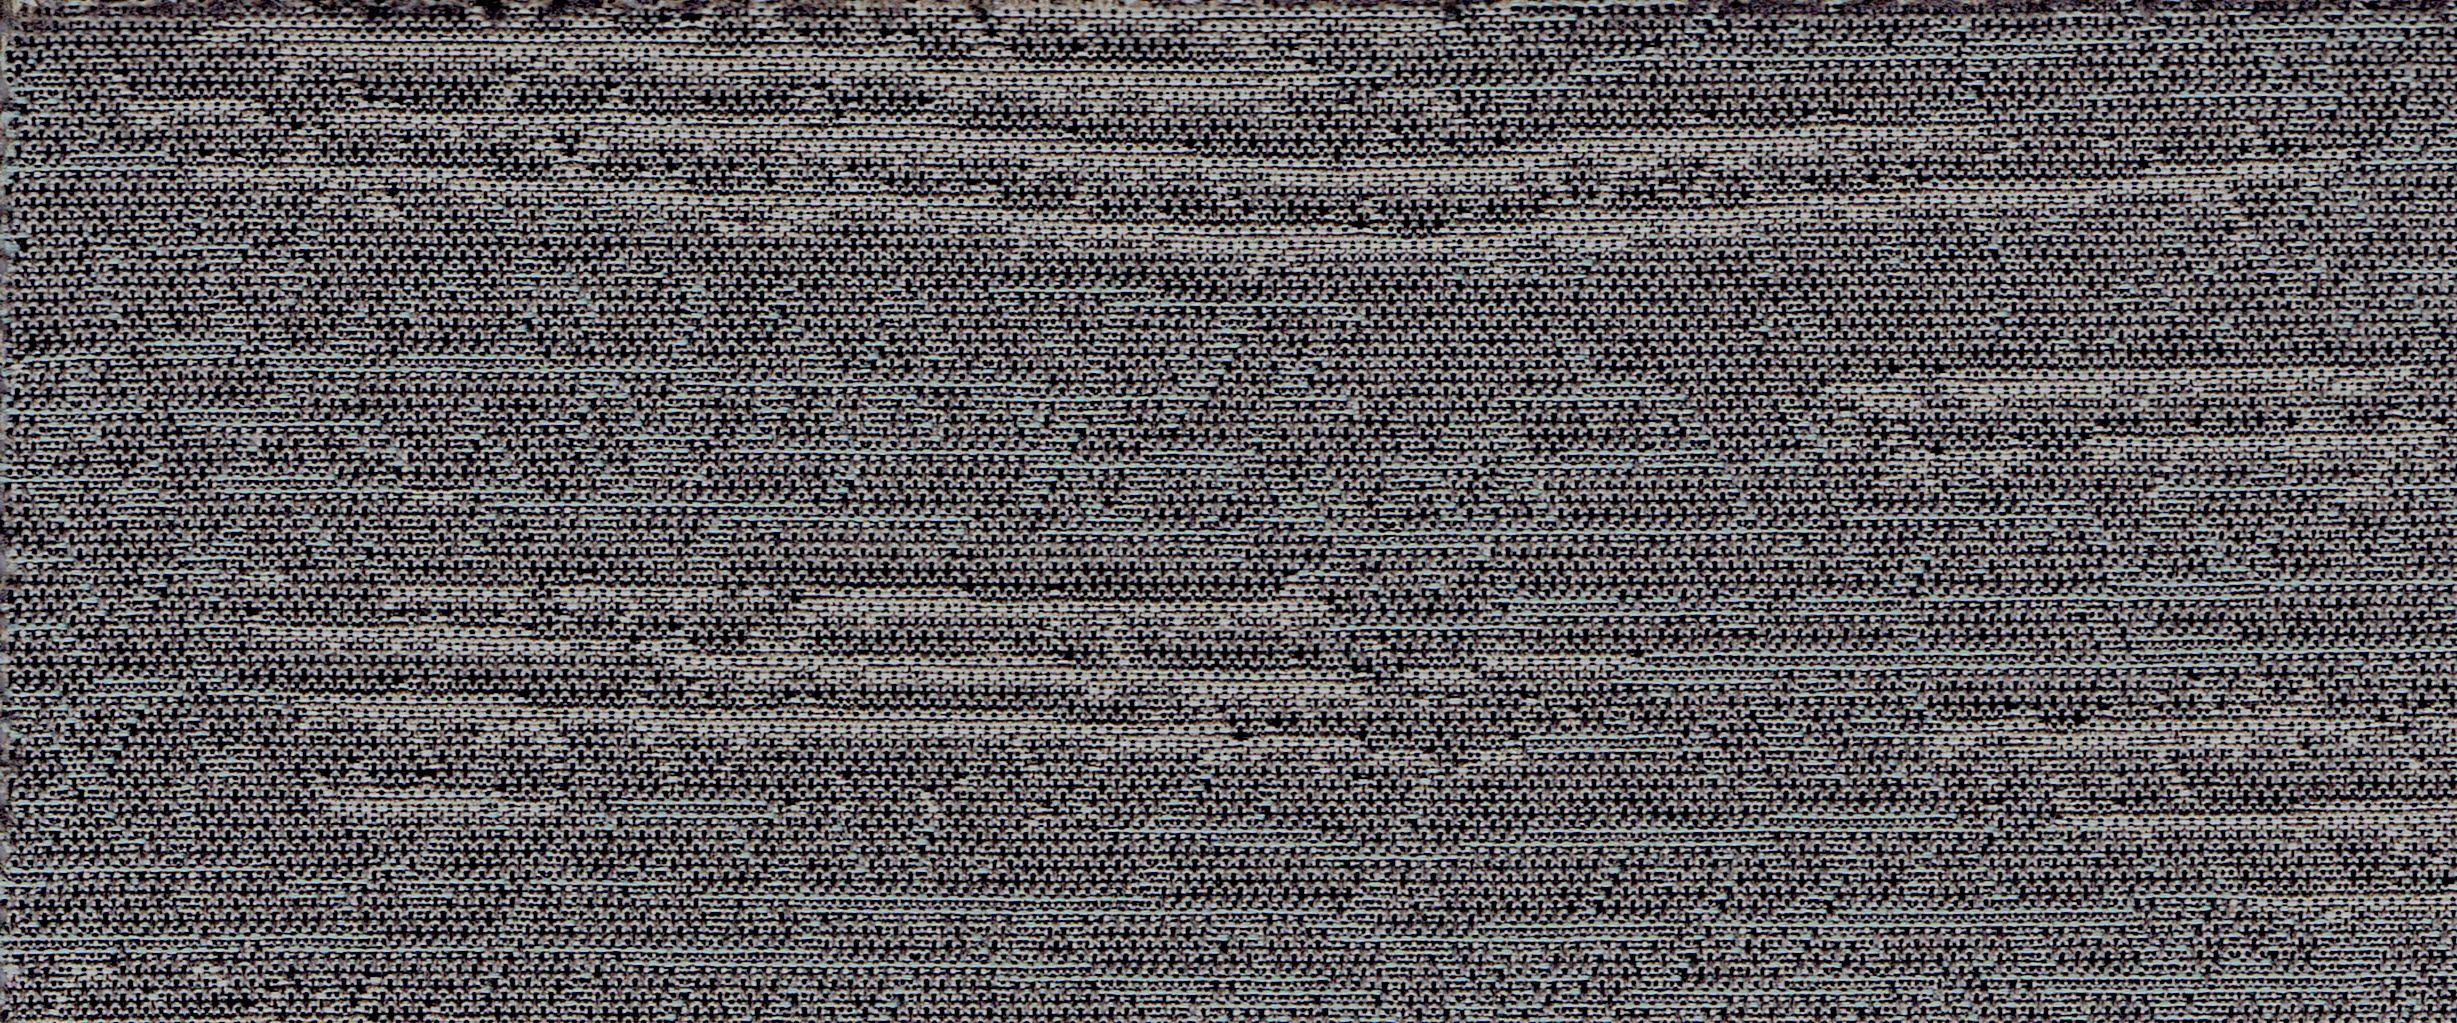 fabric26082015_0009.jpg